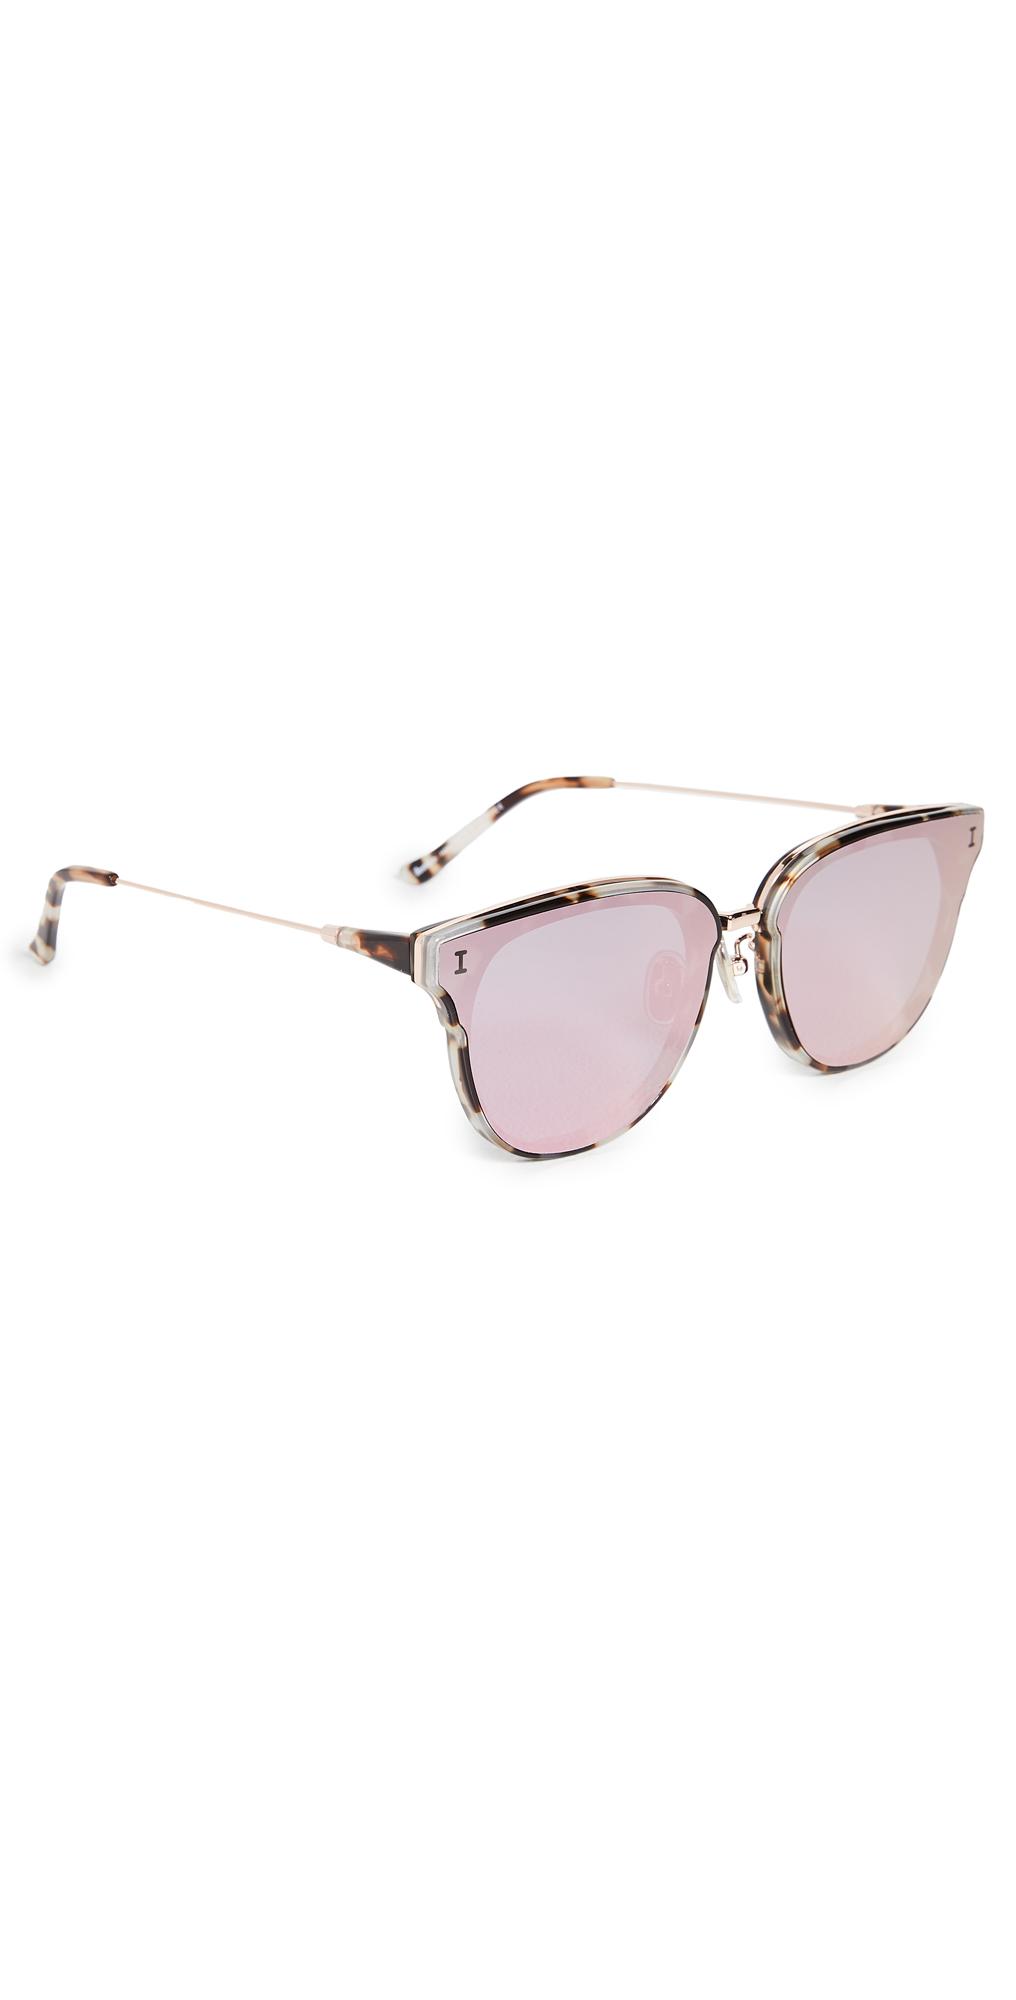 Aoyama White Tortoise Sunglasses